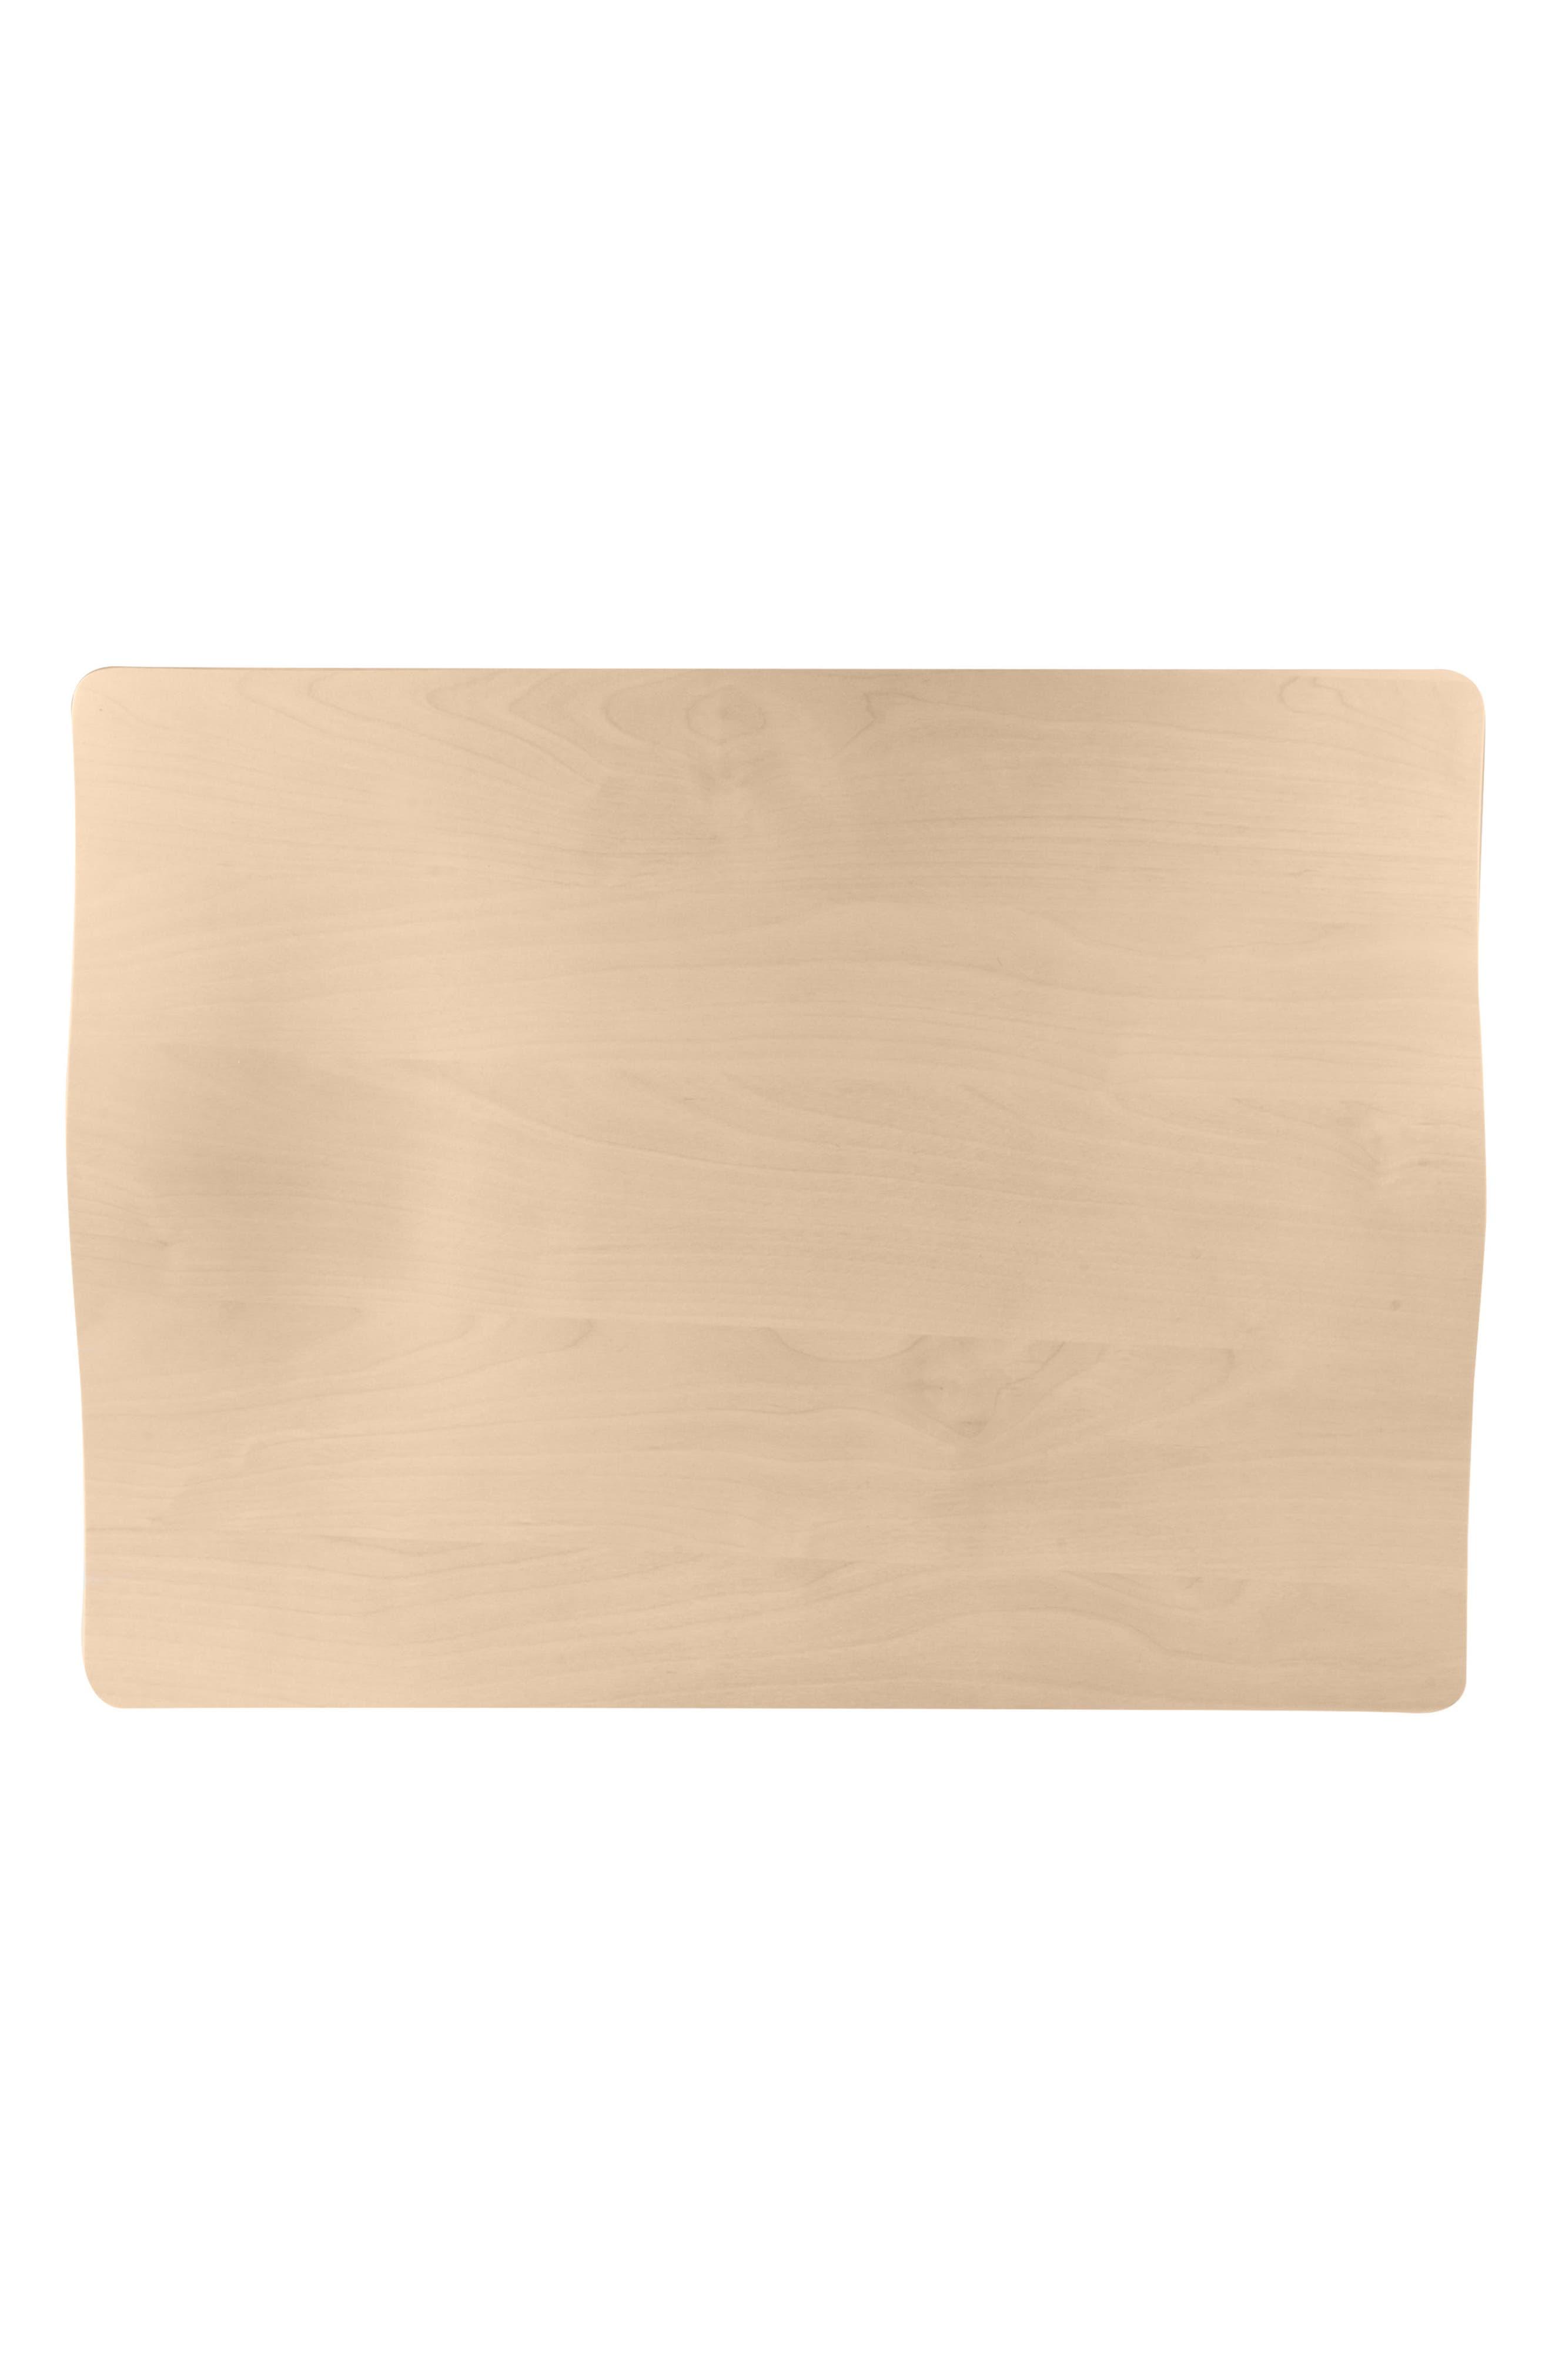 Square Birch & Melamine Serving Tray,                             Alternate thumbnail 4, color,